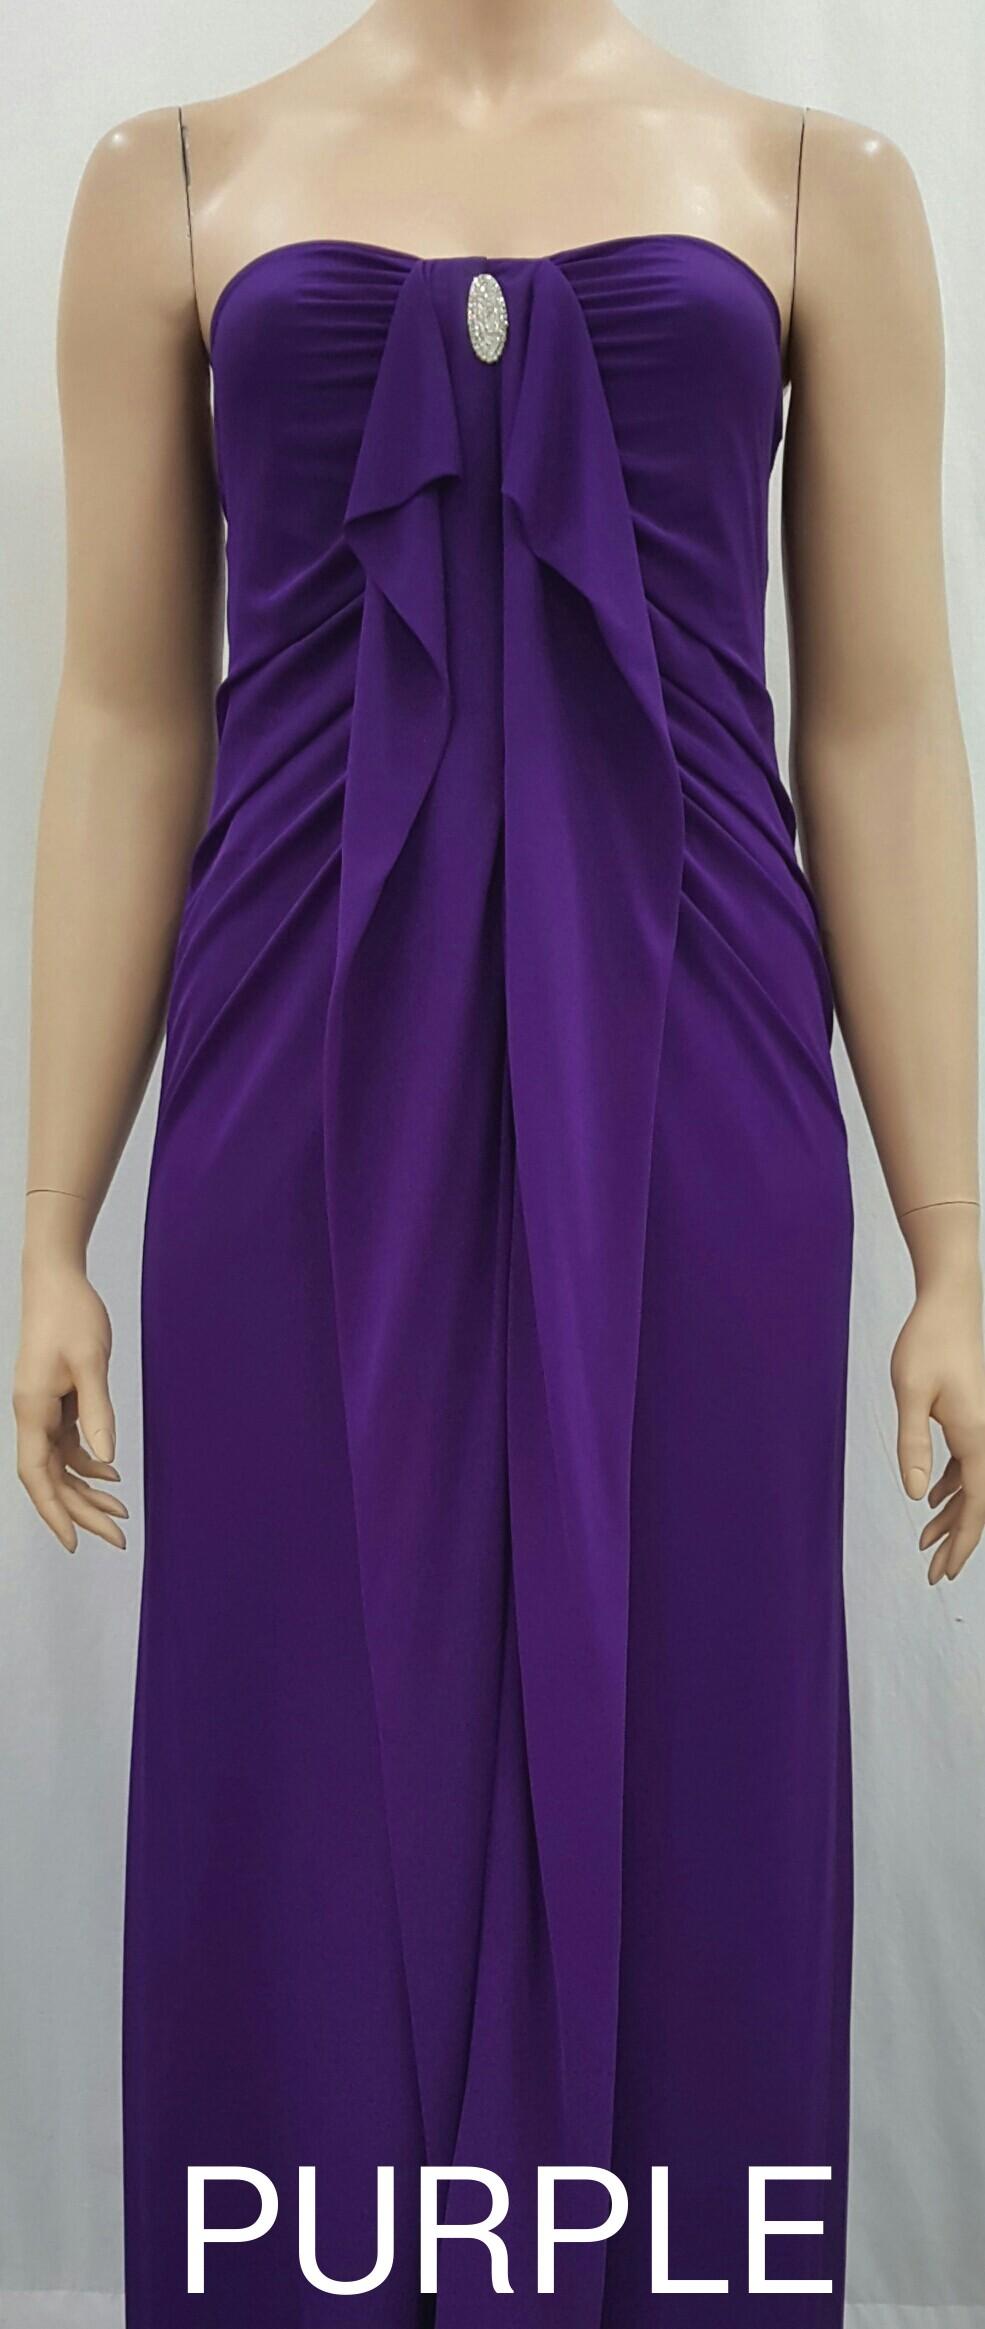 Ladies Dress 1208 [LT1208] - $55.00 : Girls dresses and Boys suits ...